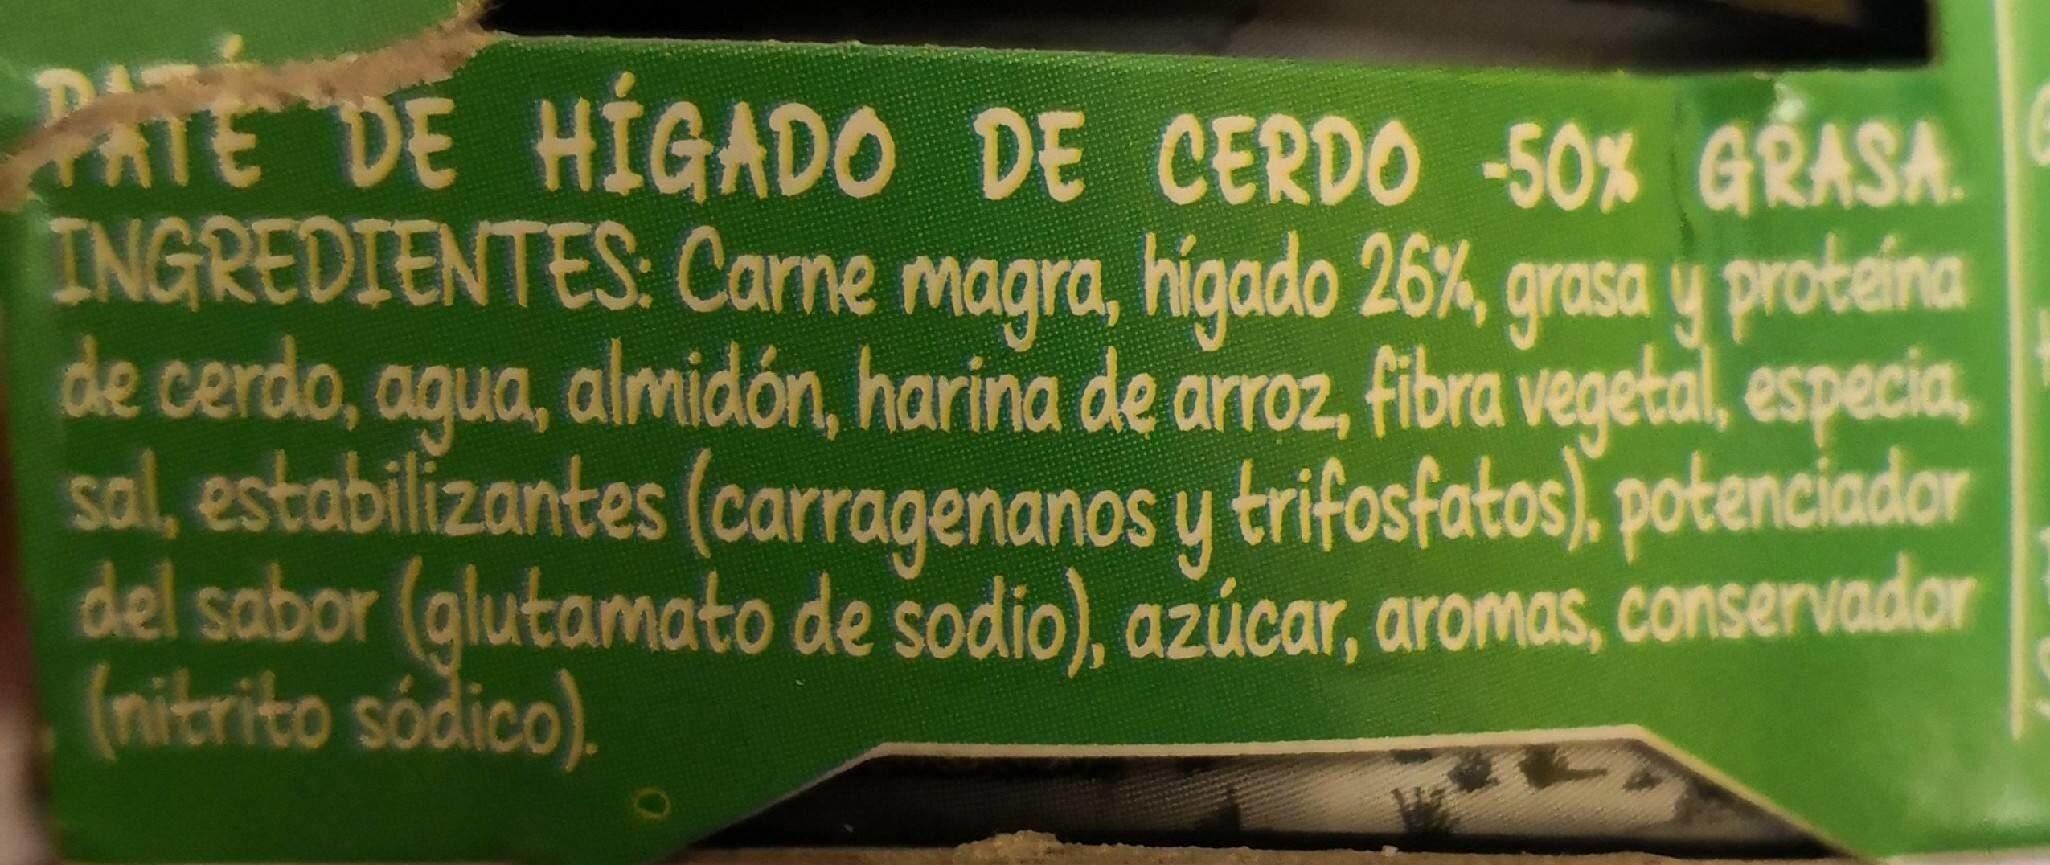 Paté de hígado de cerdo bajo en materia grasa - Ingrédients